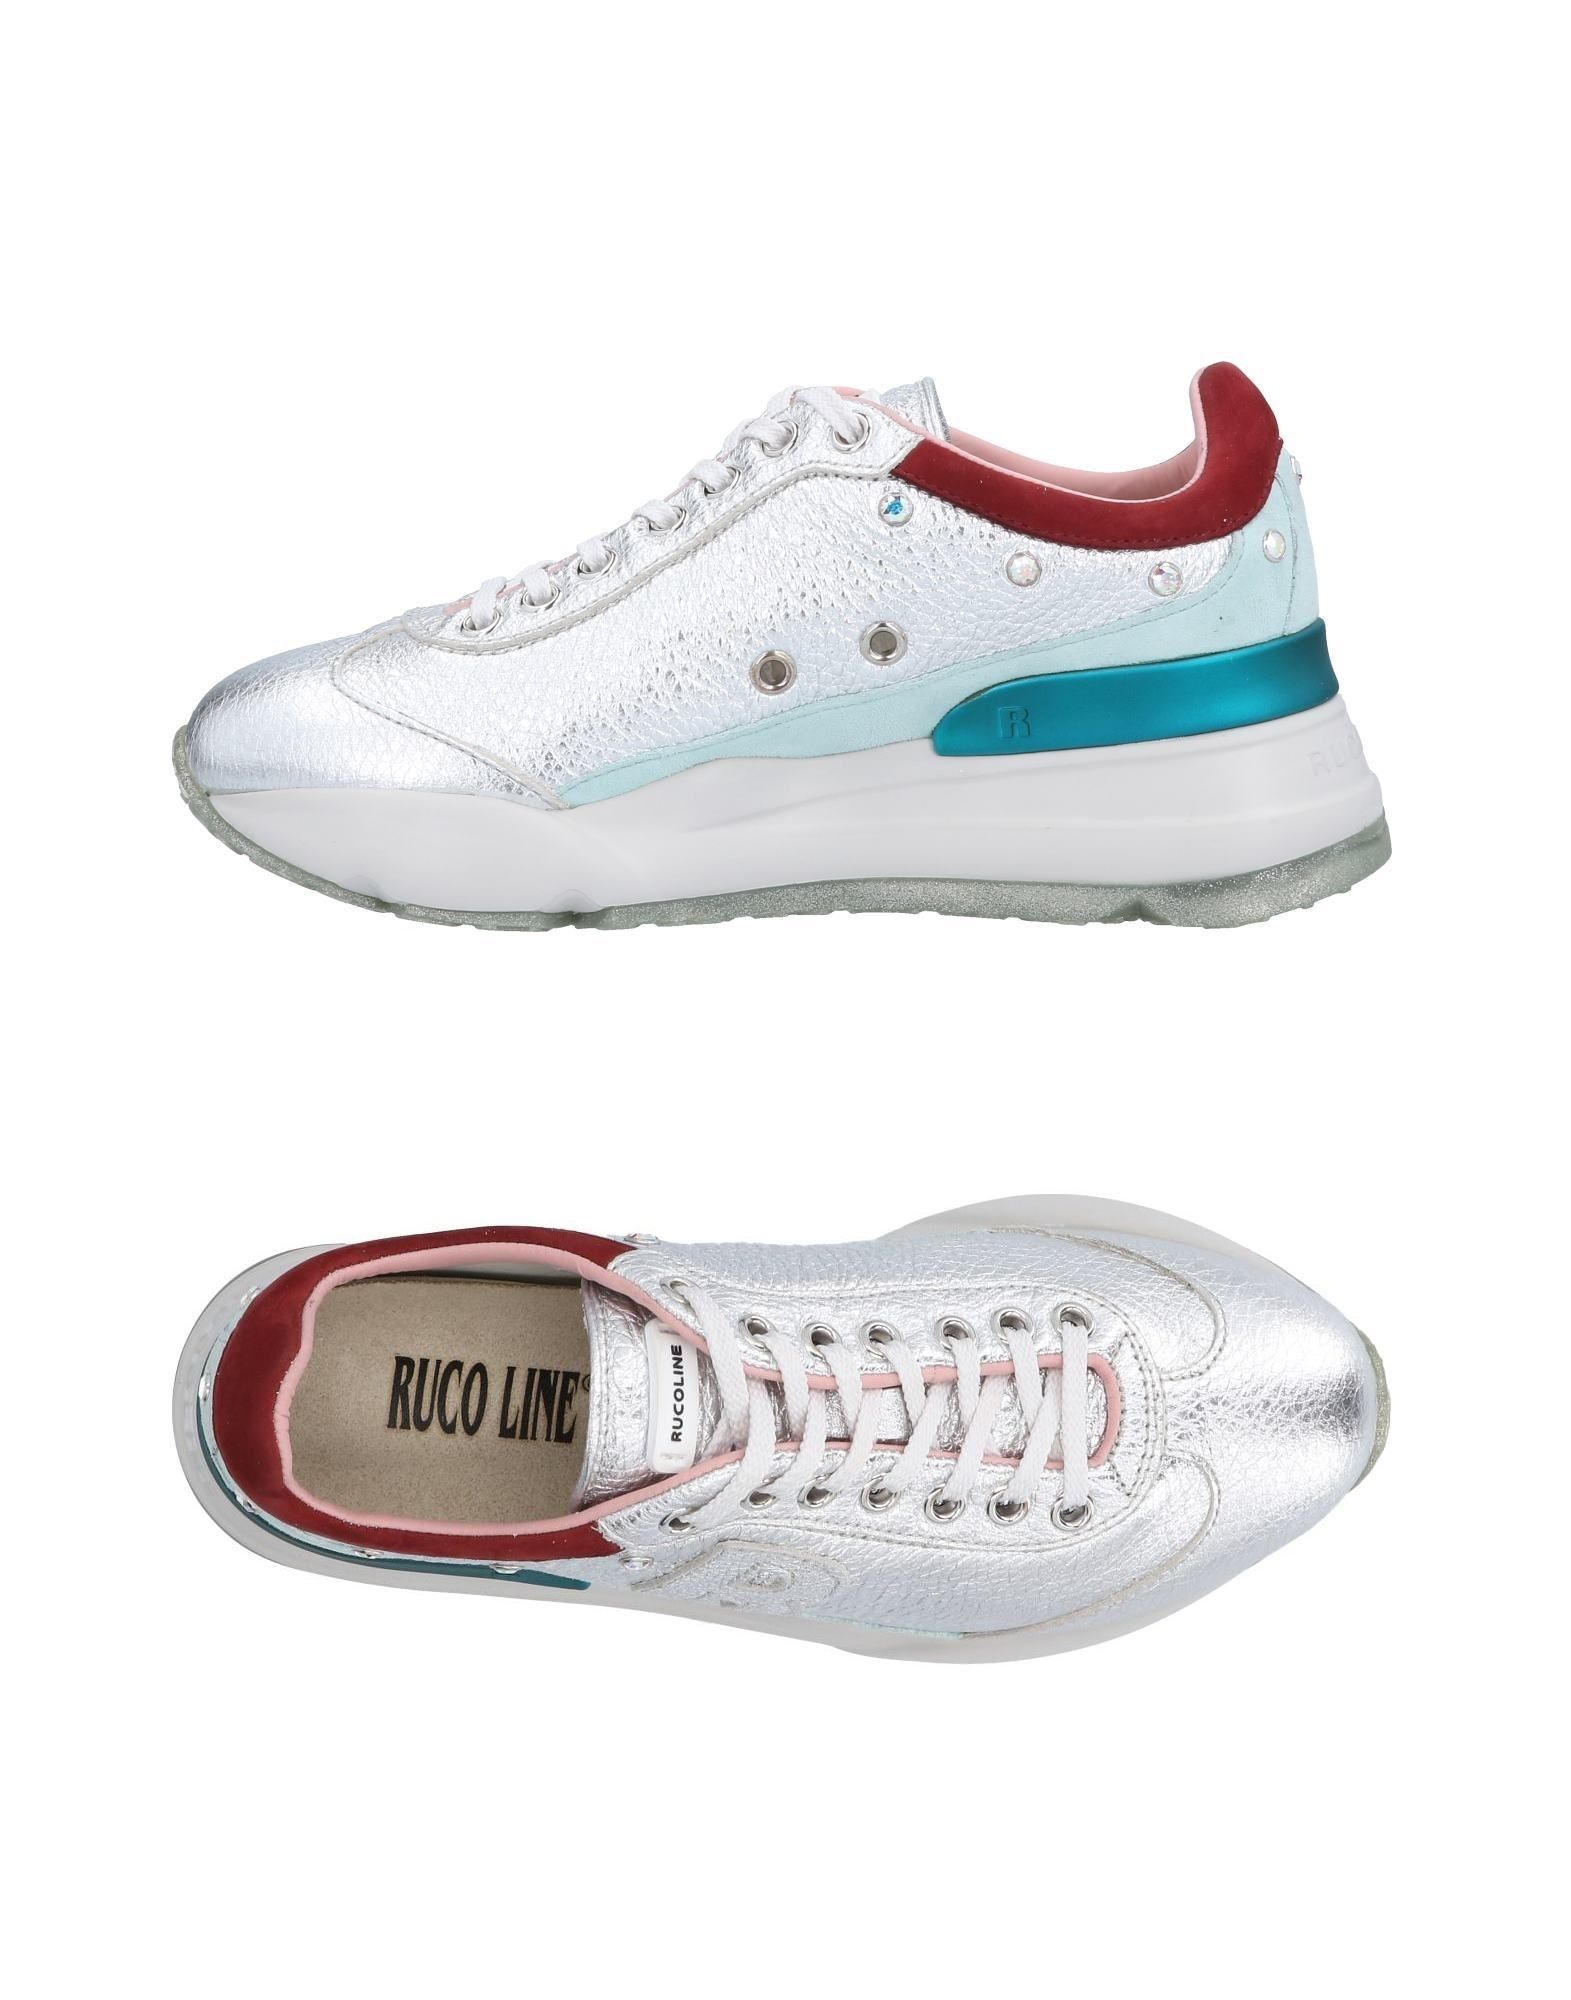 Ruco Line Sneakers  Damen  Sneakers 11498362KF Neue Schuhe b2d3cb